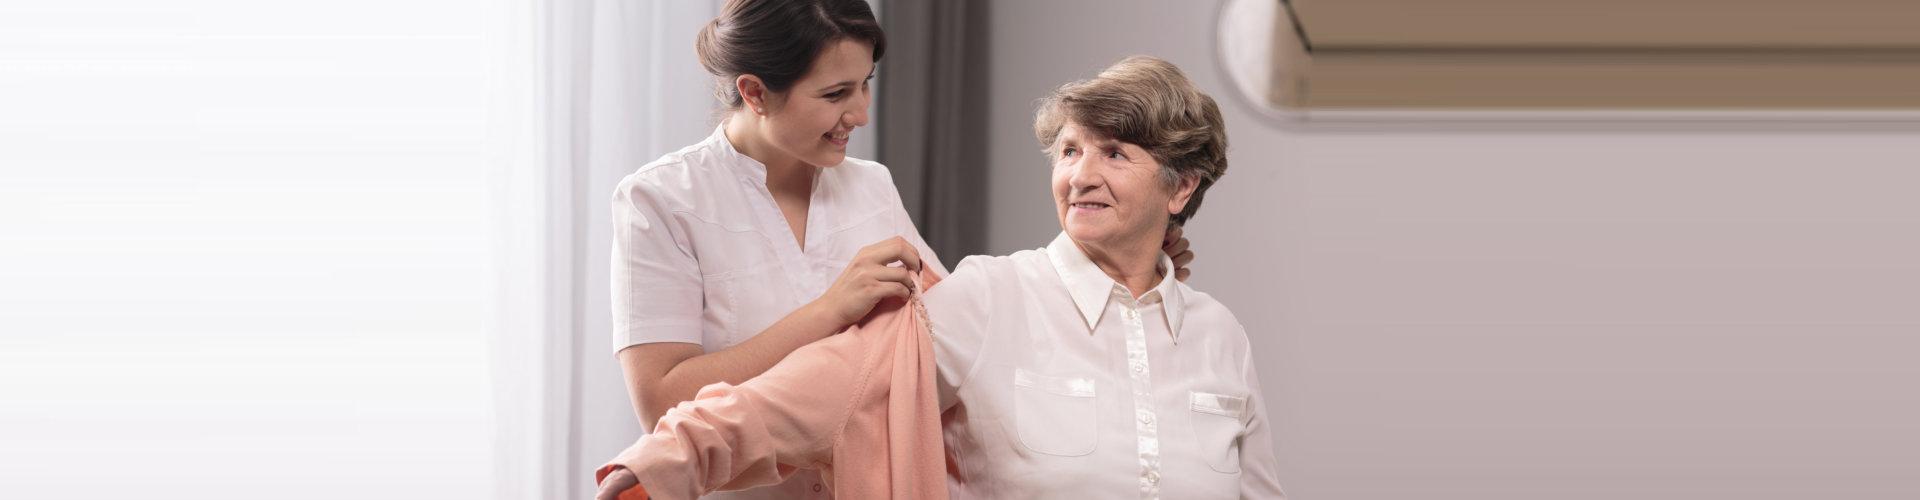 caregiver assisting elder woman on wearing a shirt